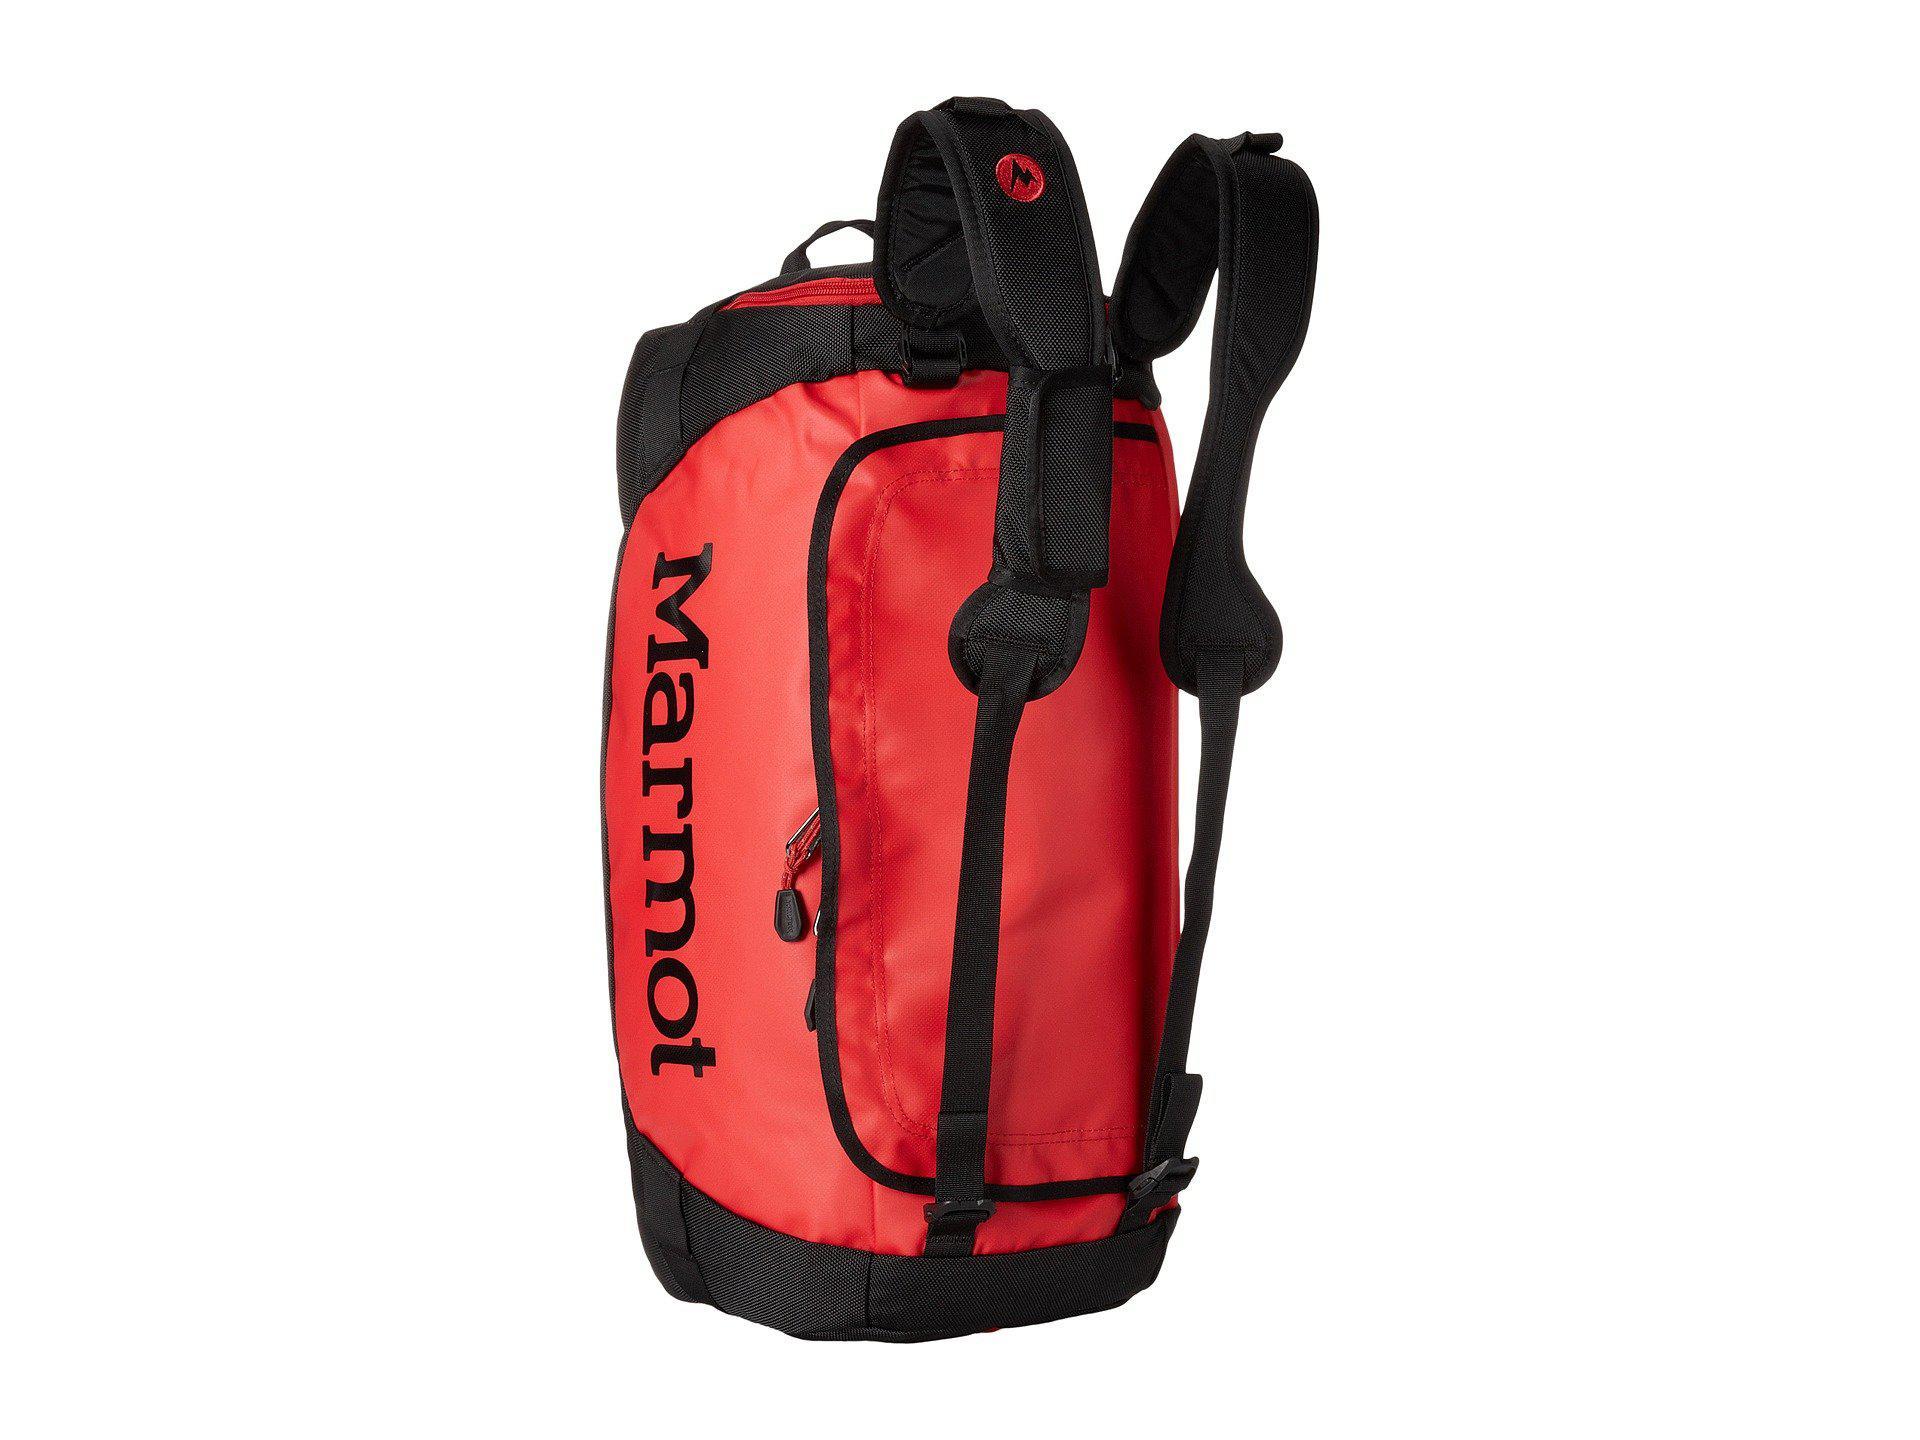 6f1760c57c61 Marmot - Long Hauler Duffle Bag - Small (team Red black) Duffel Bags. View  fullscreen